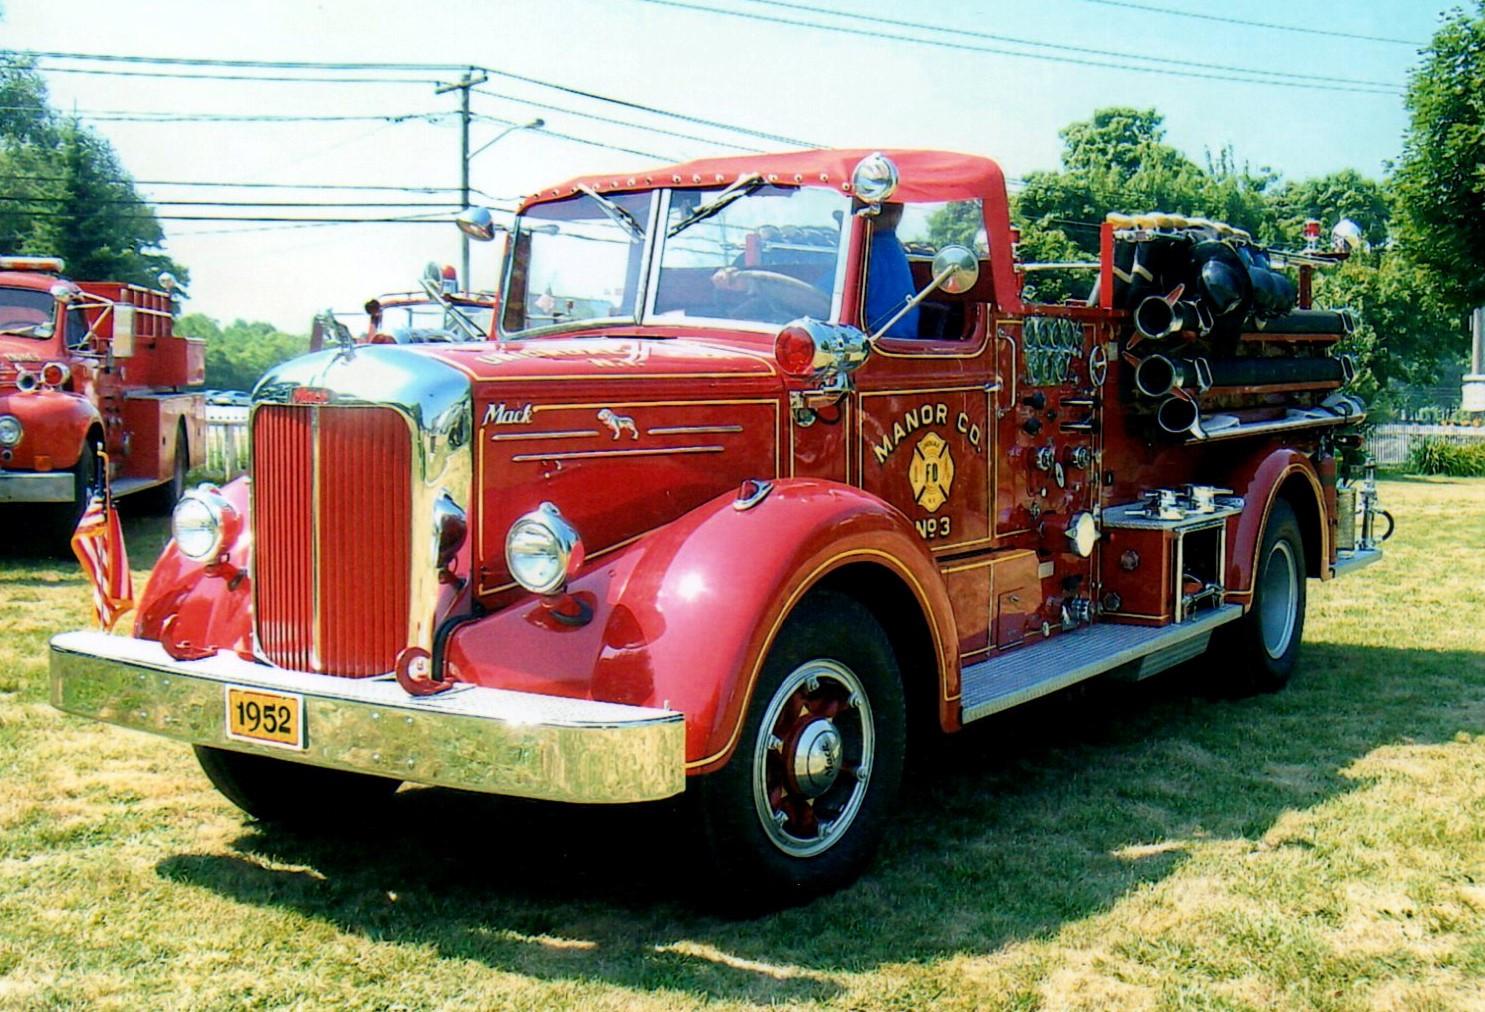 1952 Mack L model pumper - Uniondale F.D.